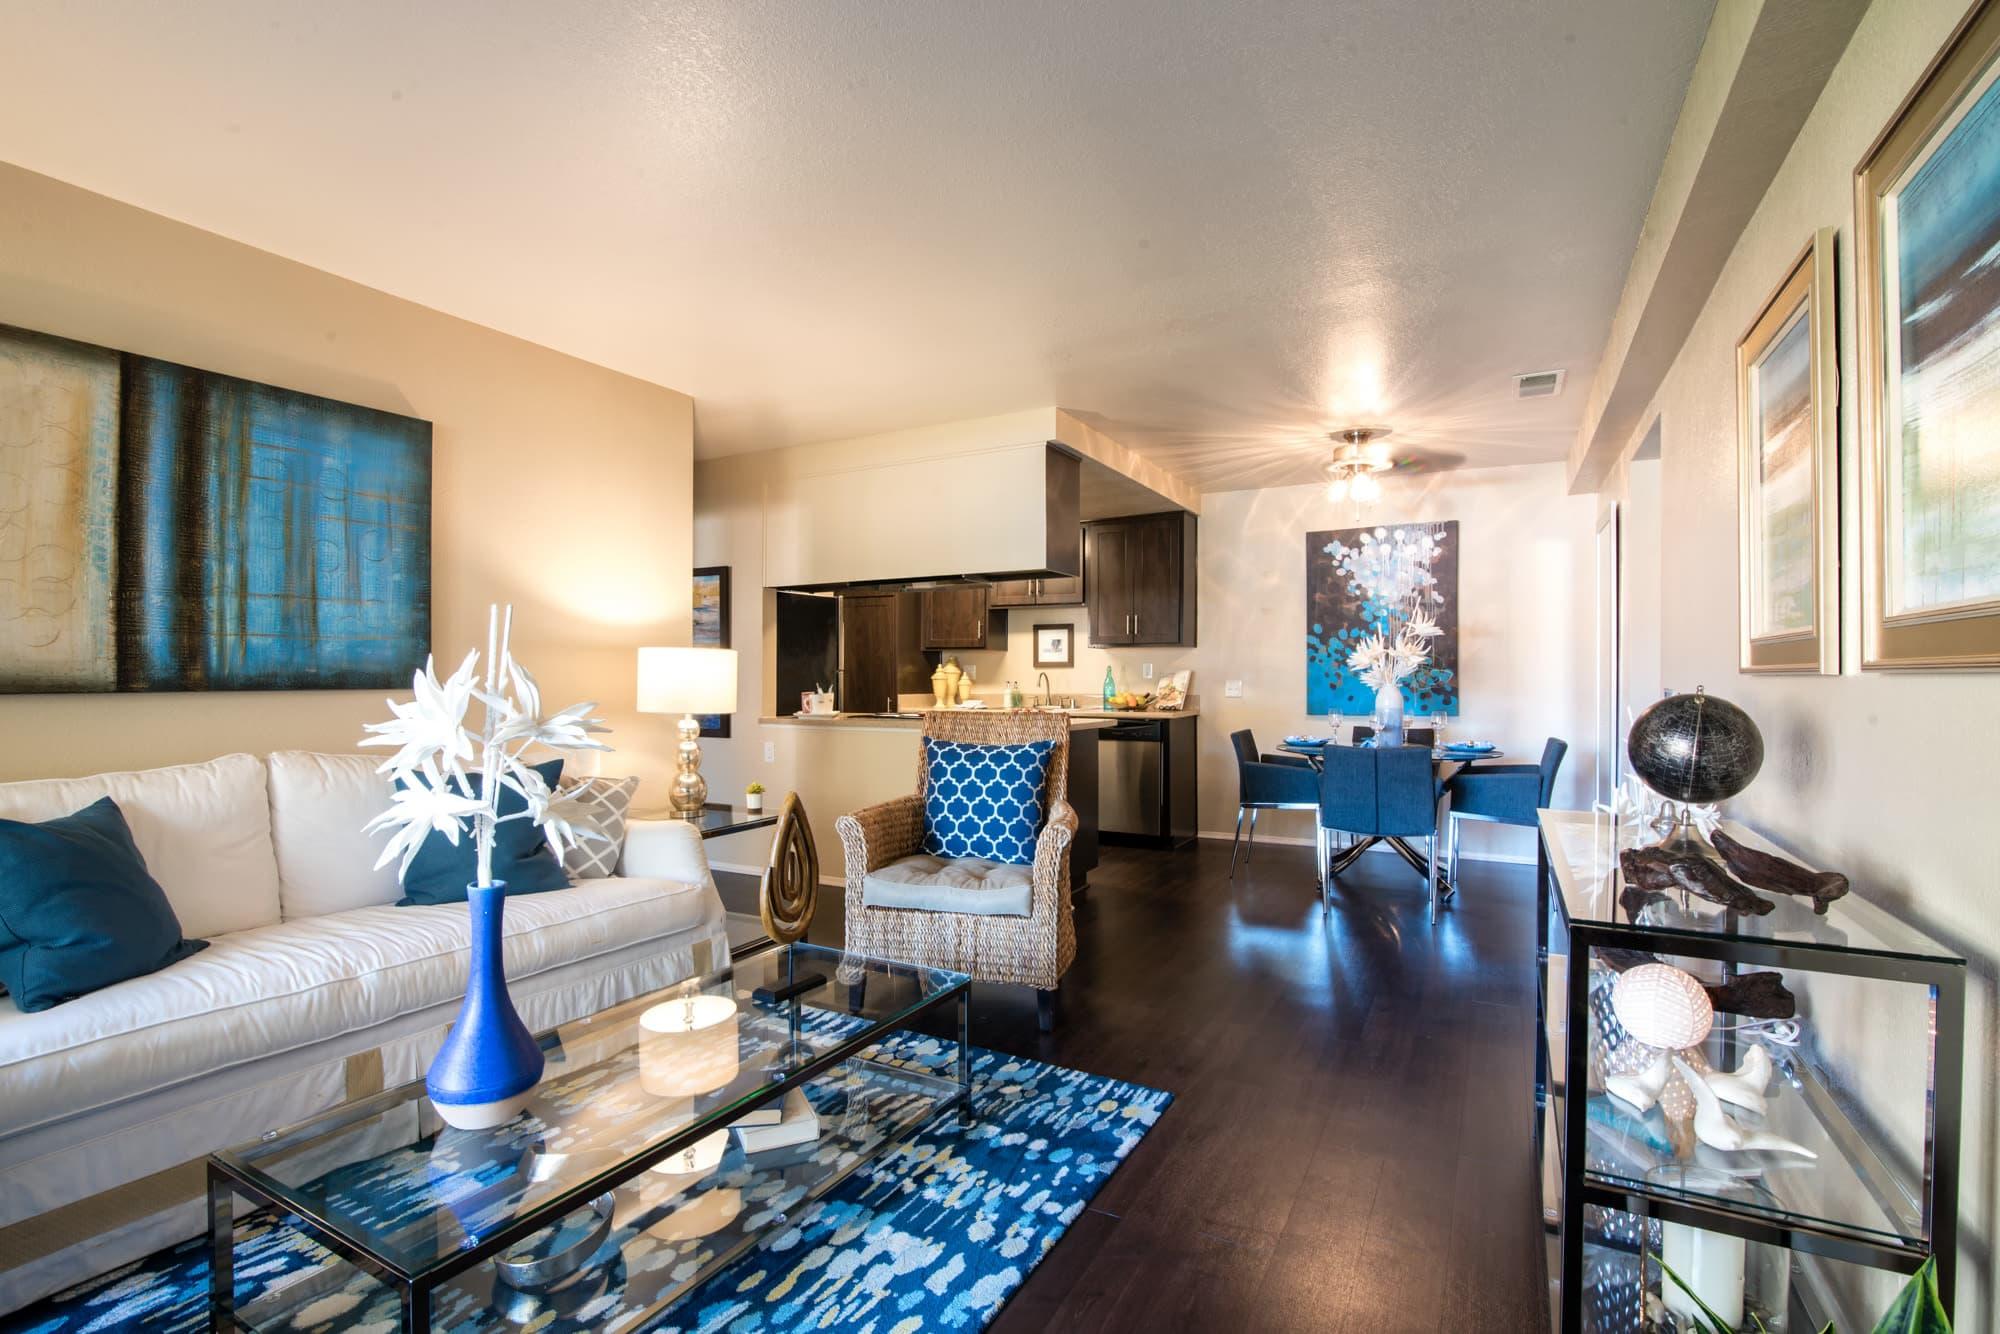 Living Room at Terra Nova Villas in Chula Vista, CA